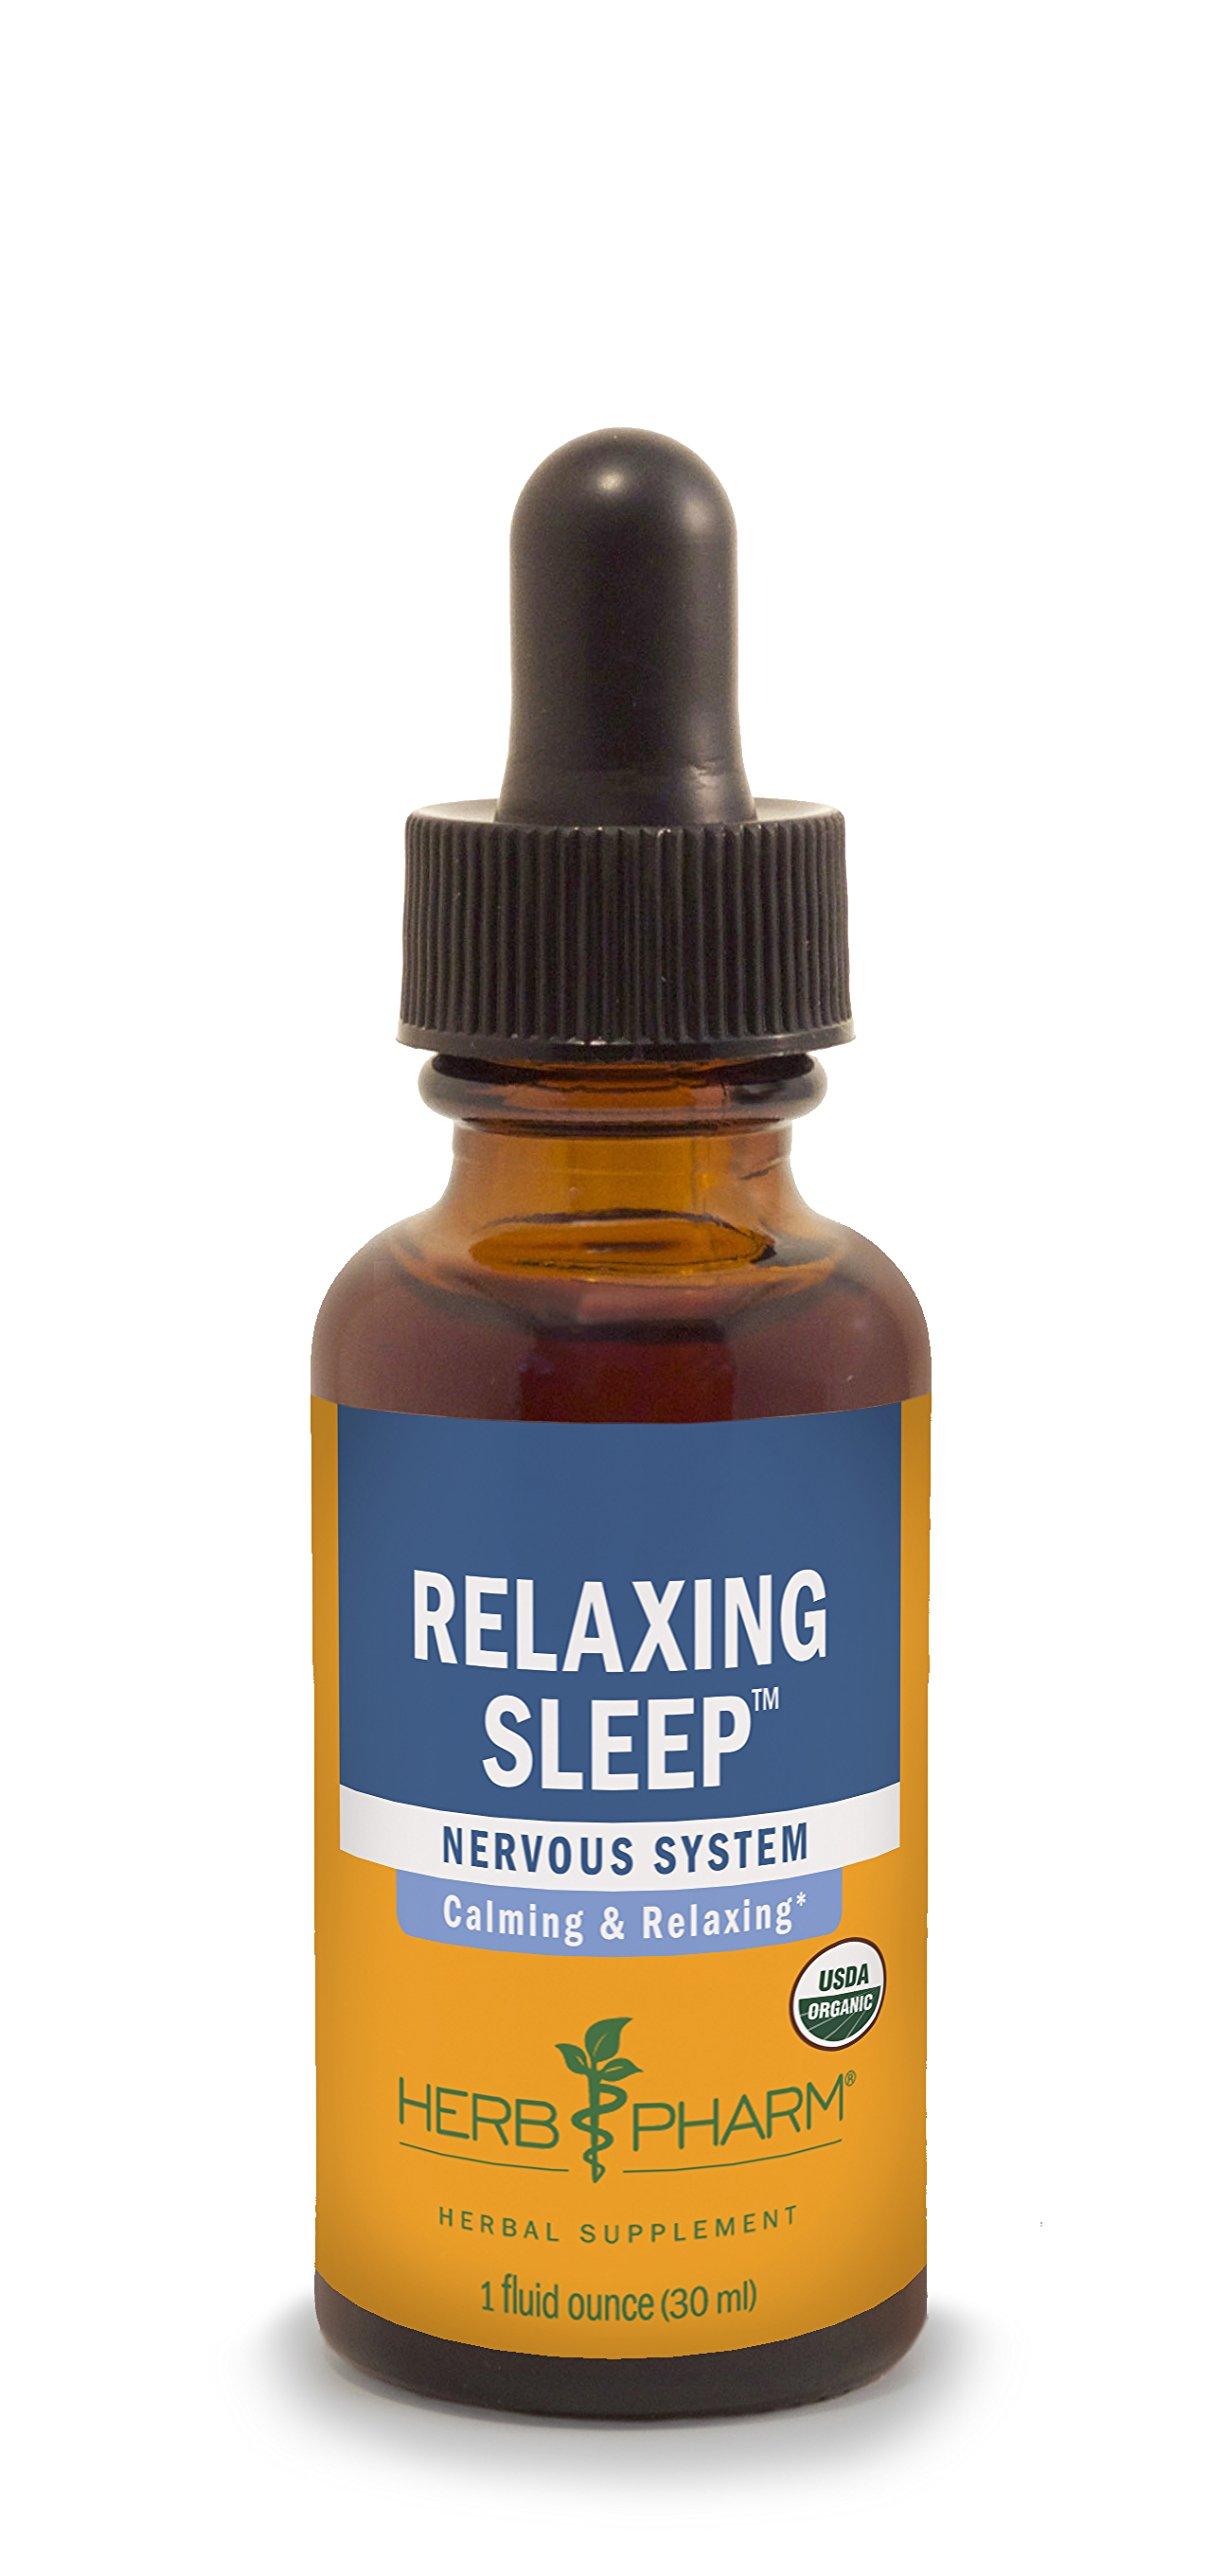 Herb Pharm Relaxing Sleep Herbal Formula with Valerian Extract - 1 Ounce